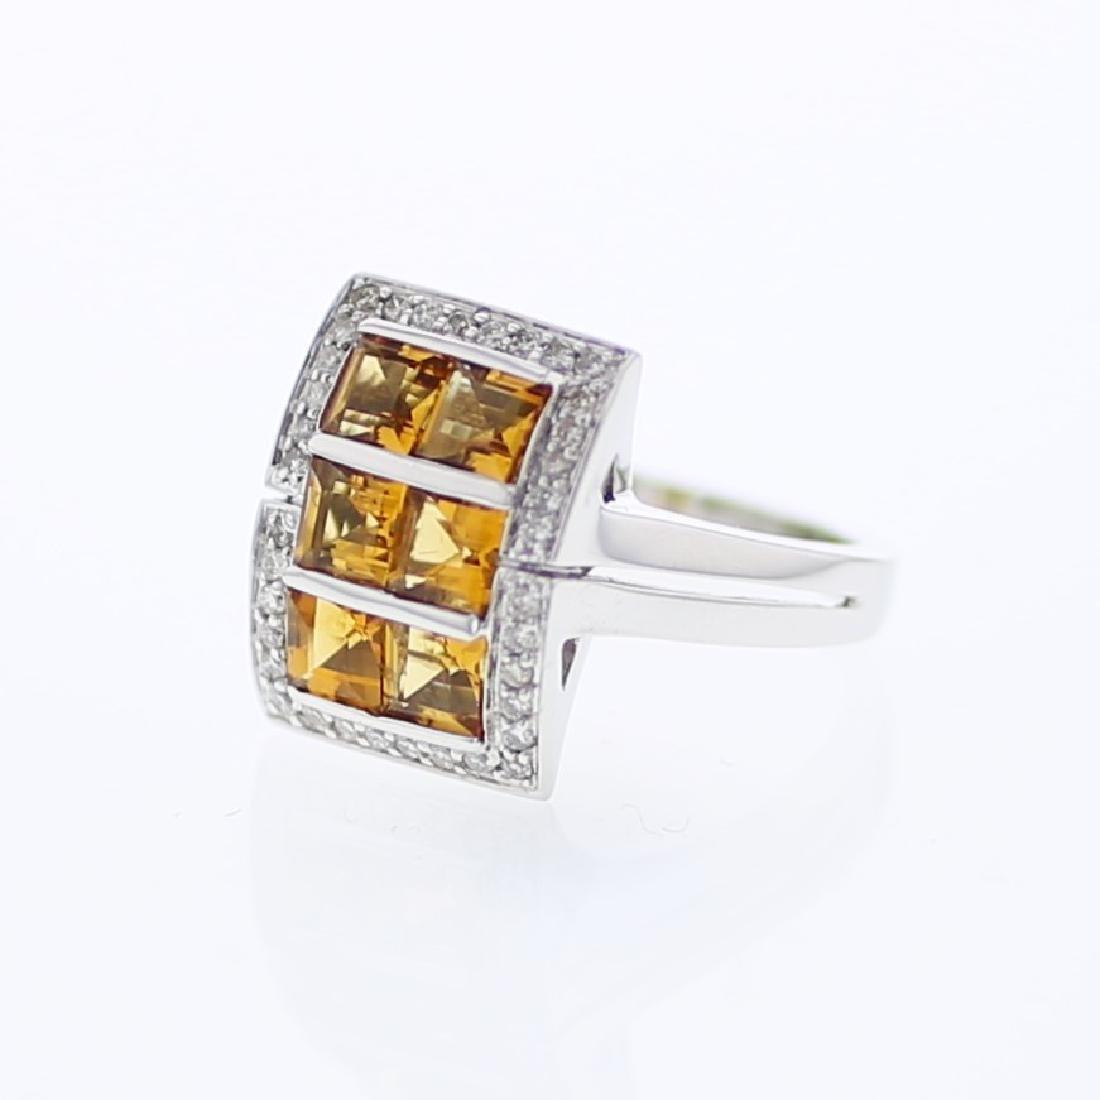 18KT White Gold 1.78ctw Citrine and Diamond Ring